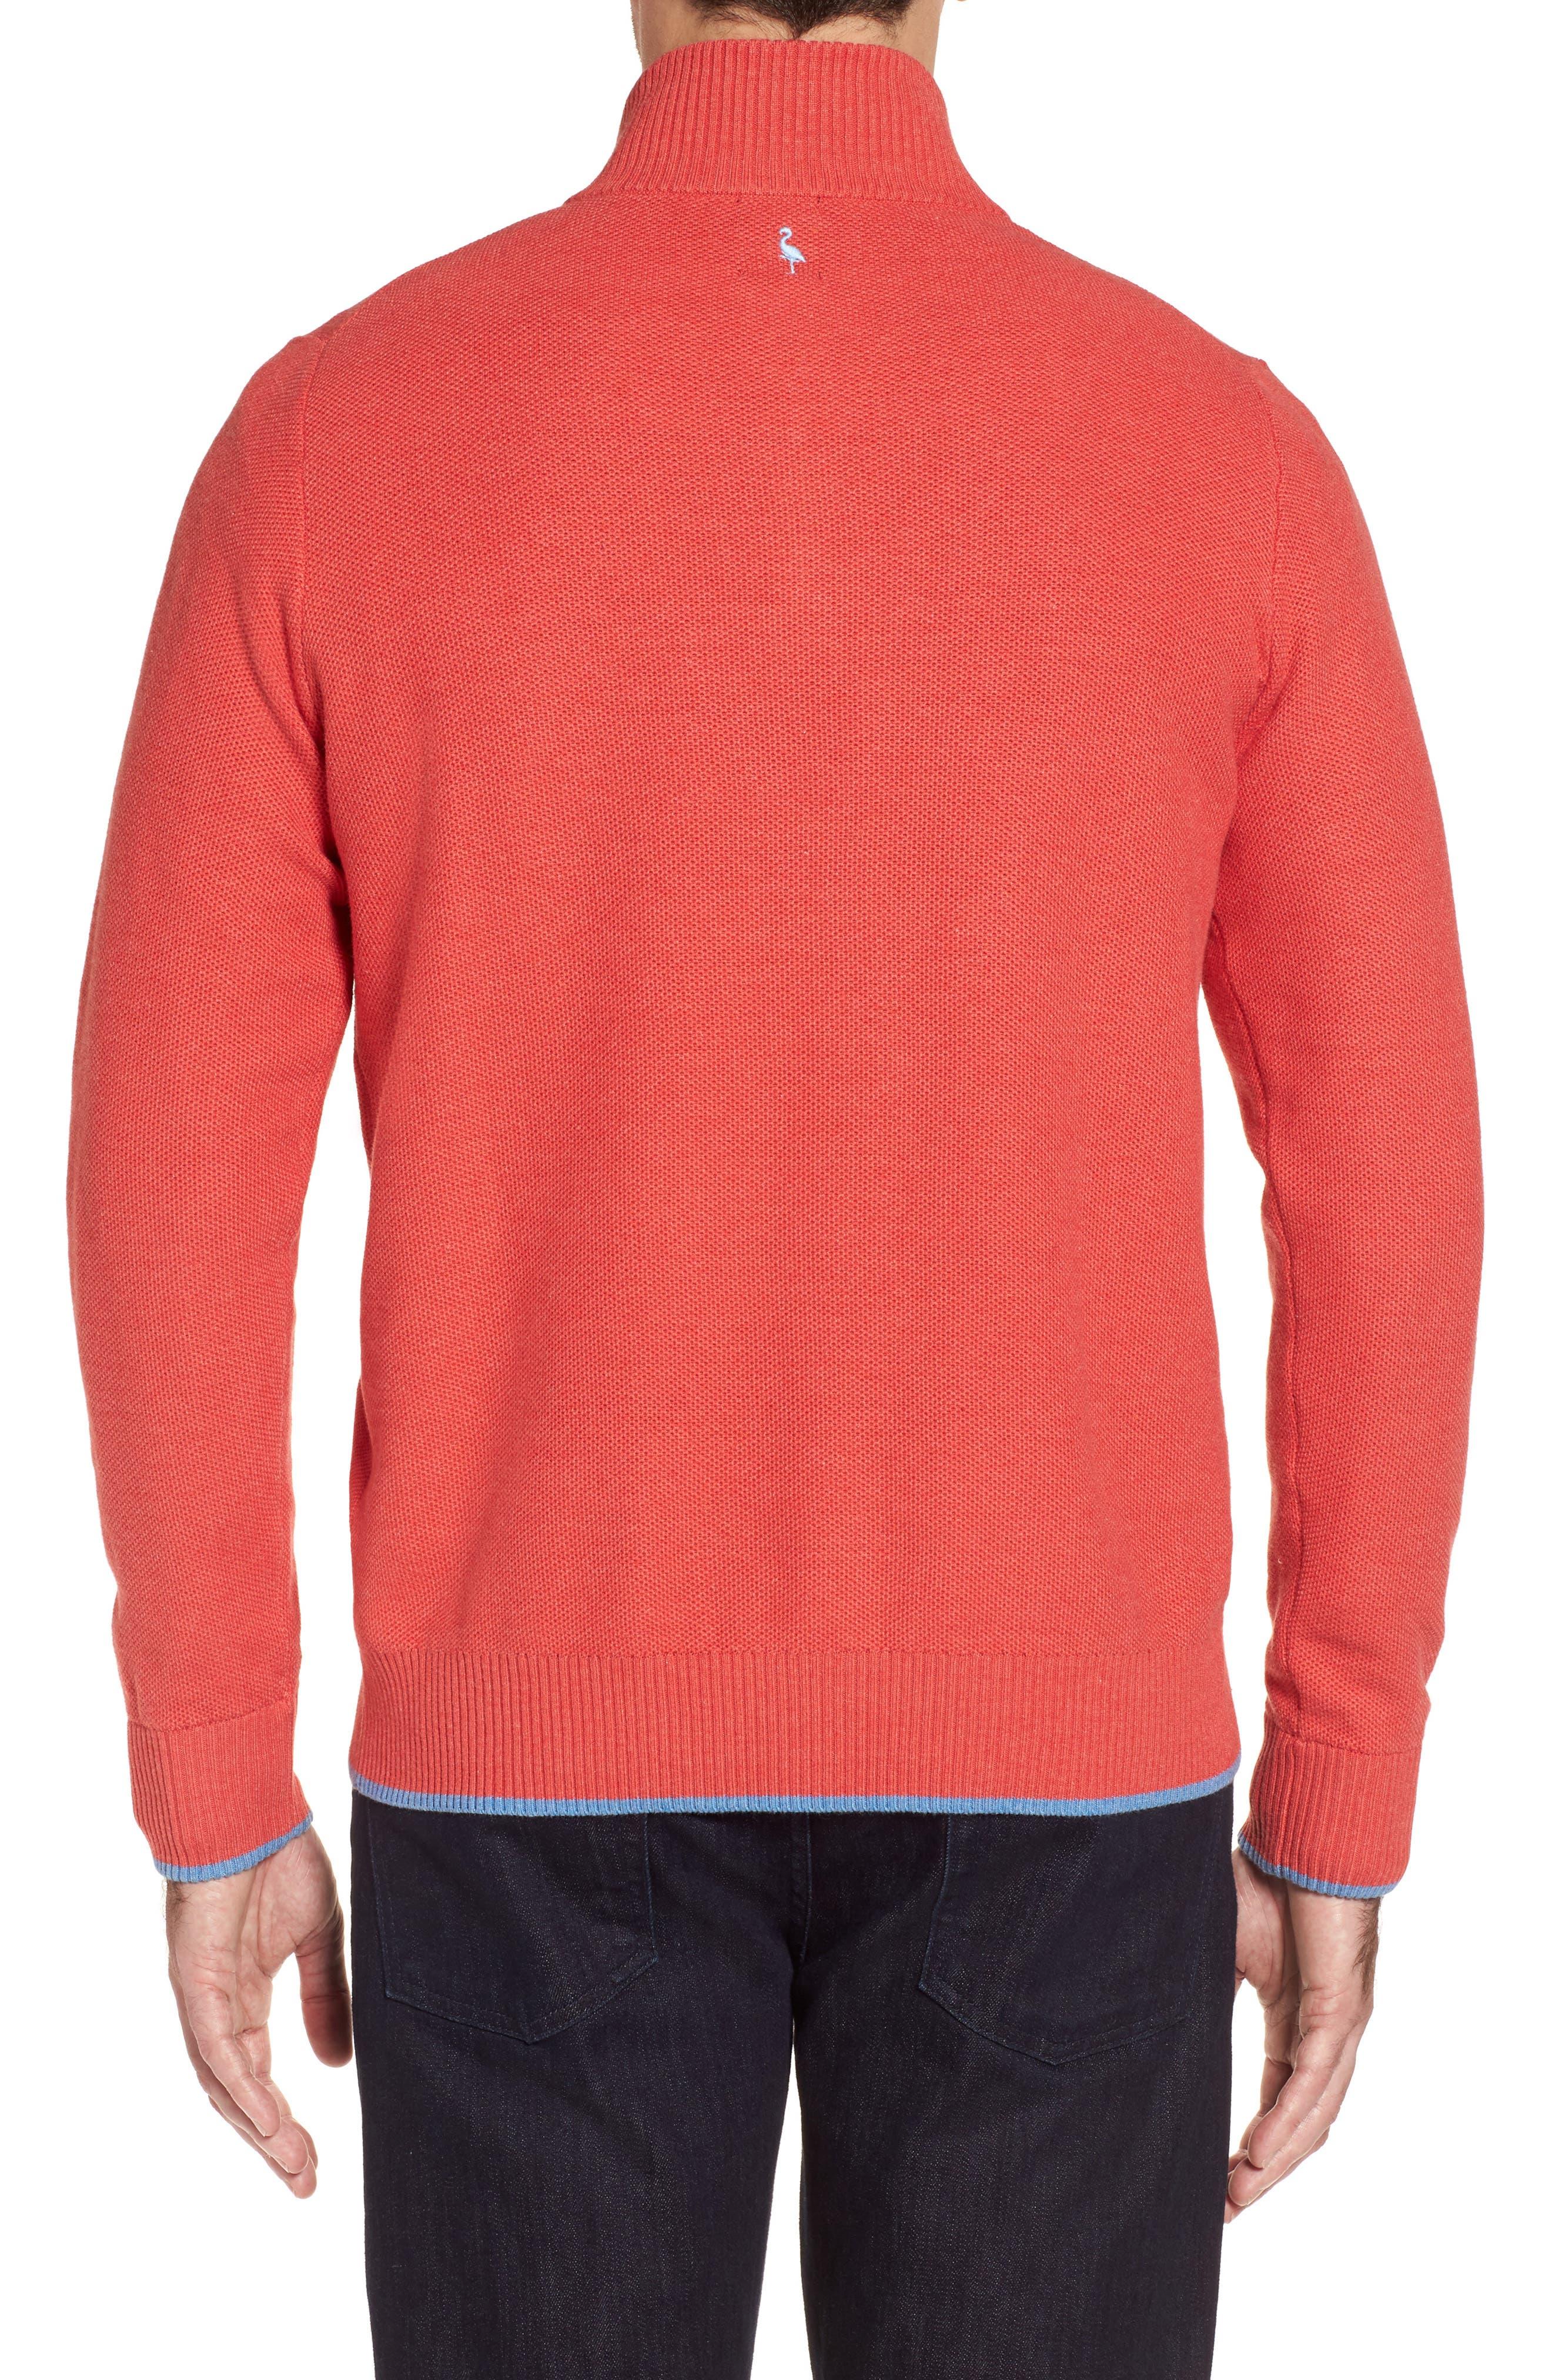 Sorrel Tipped Quarter Zip Sweater,                             Alternate thumbnail 2, color,                             Coral